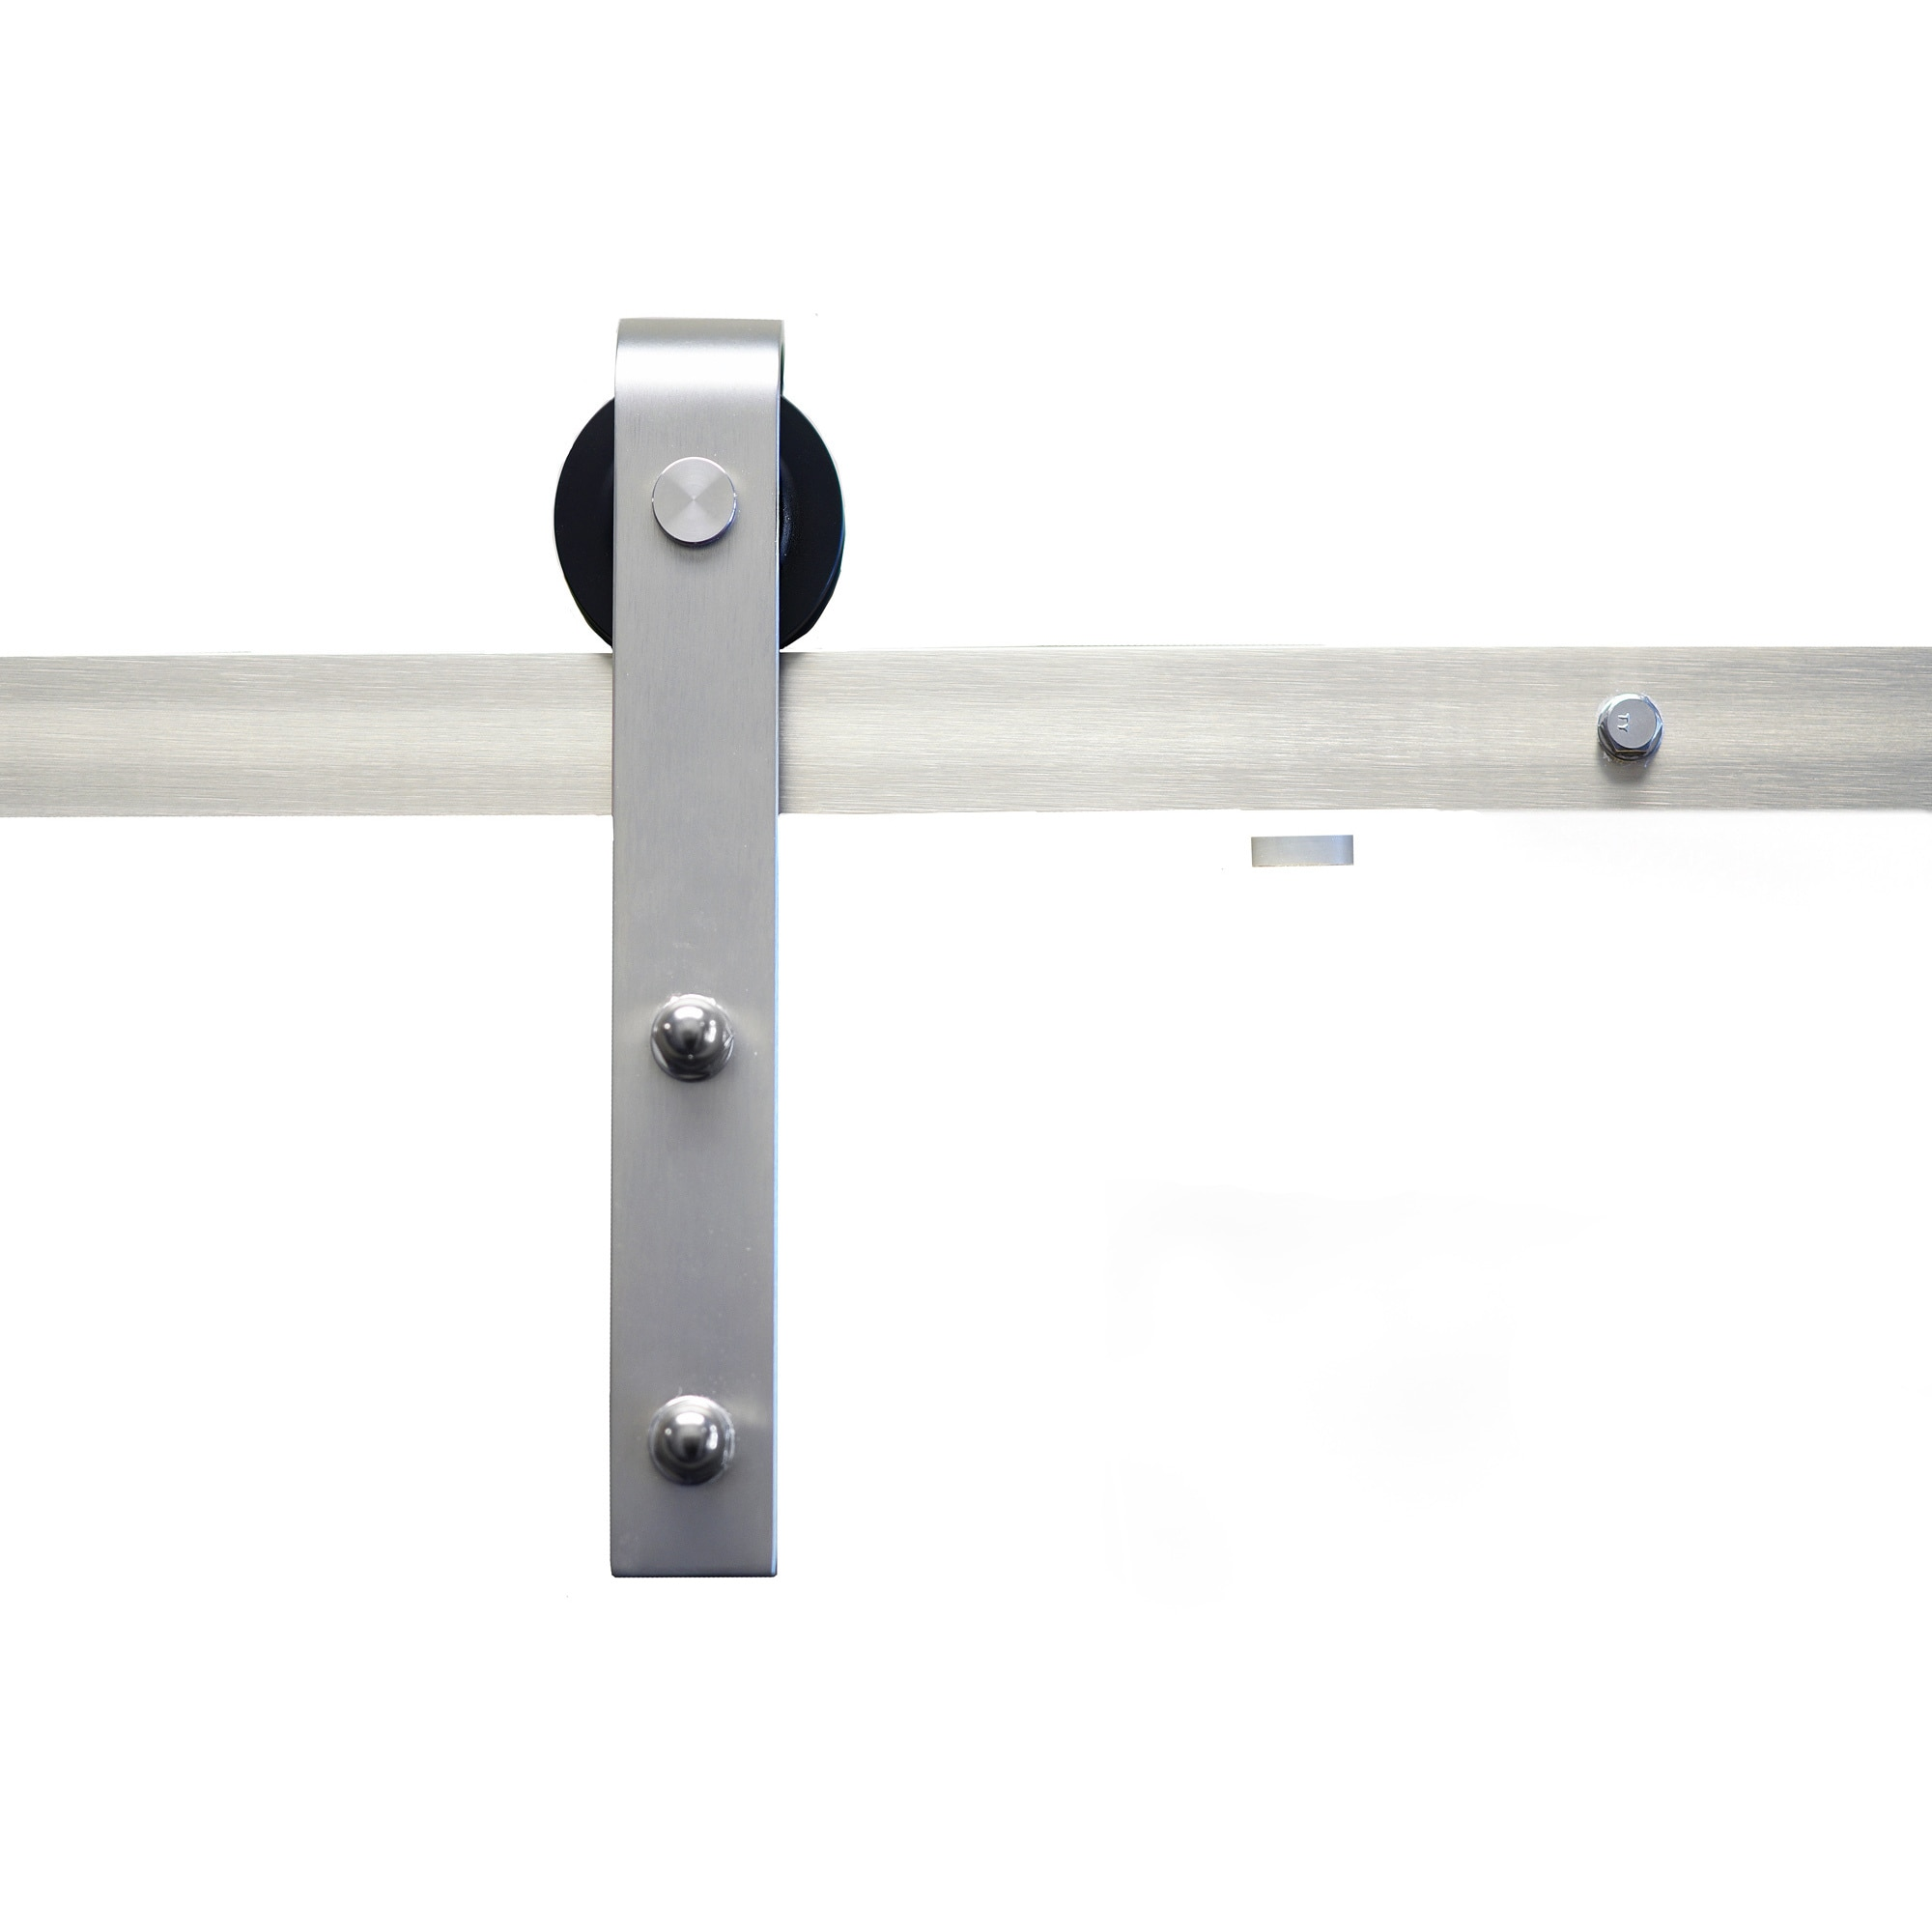 Sure Loc Satin Nickel Barn Door Hardware Kit   Free Shipping On Orders Over  $45   Overstock.com   21049332